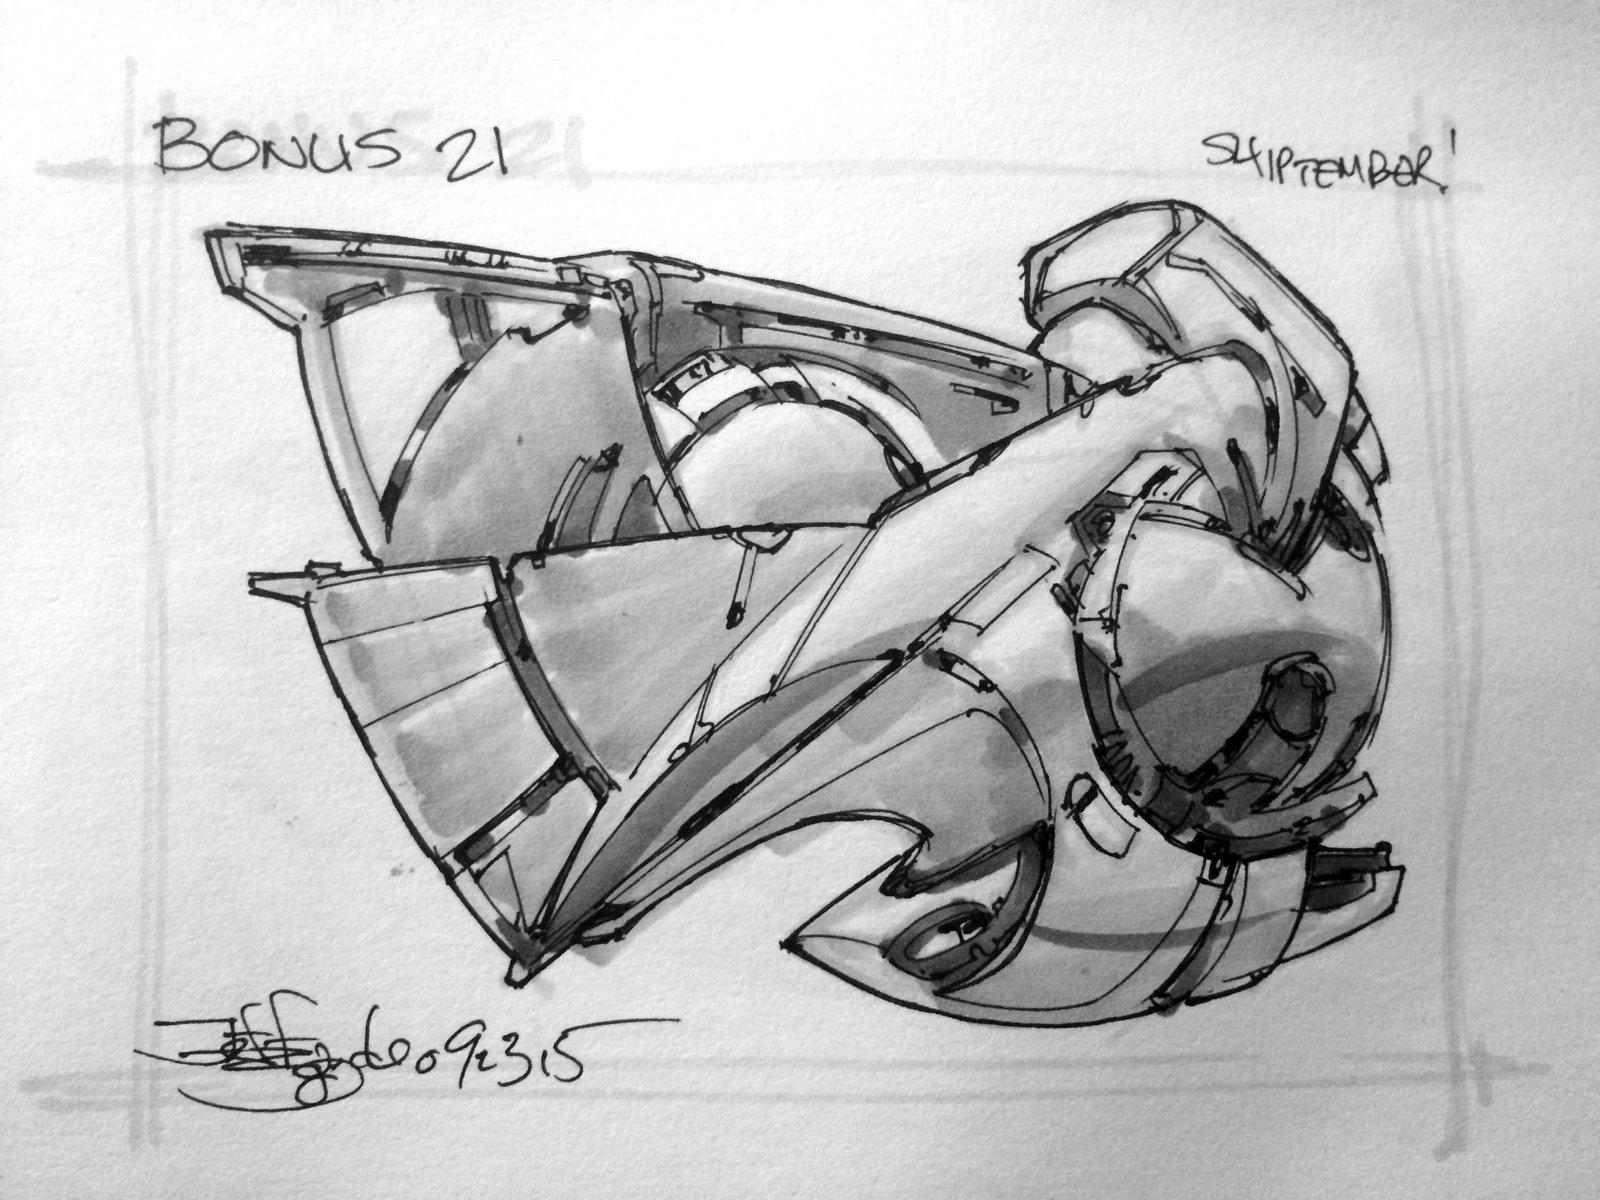 Shiptember Bonus 21